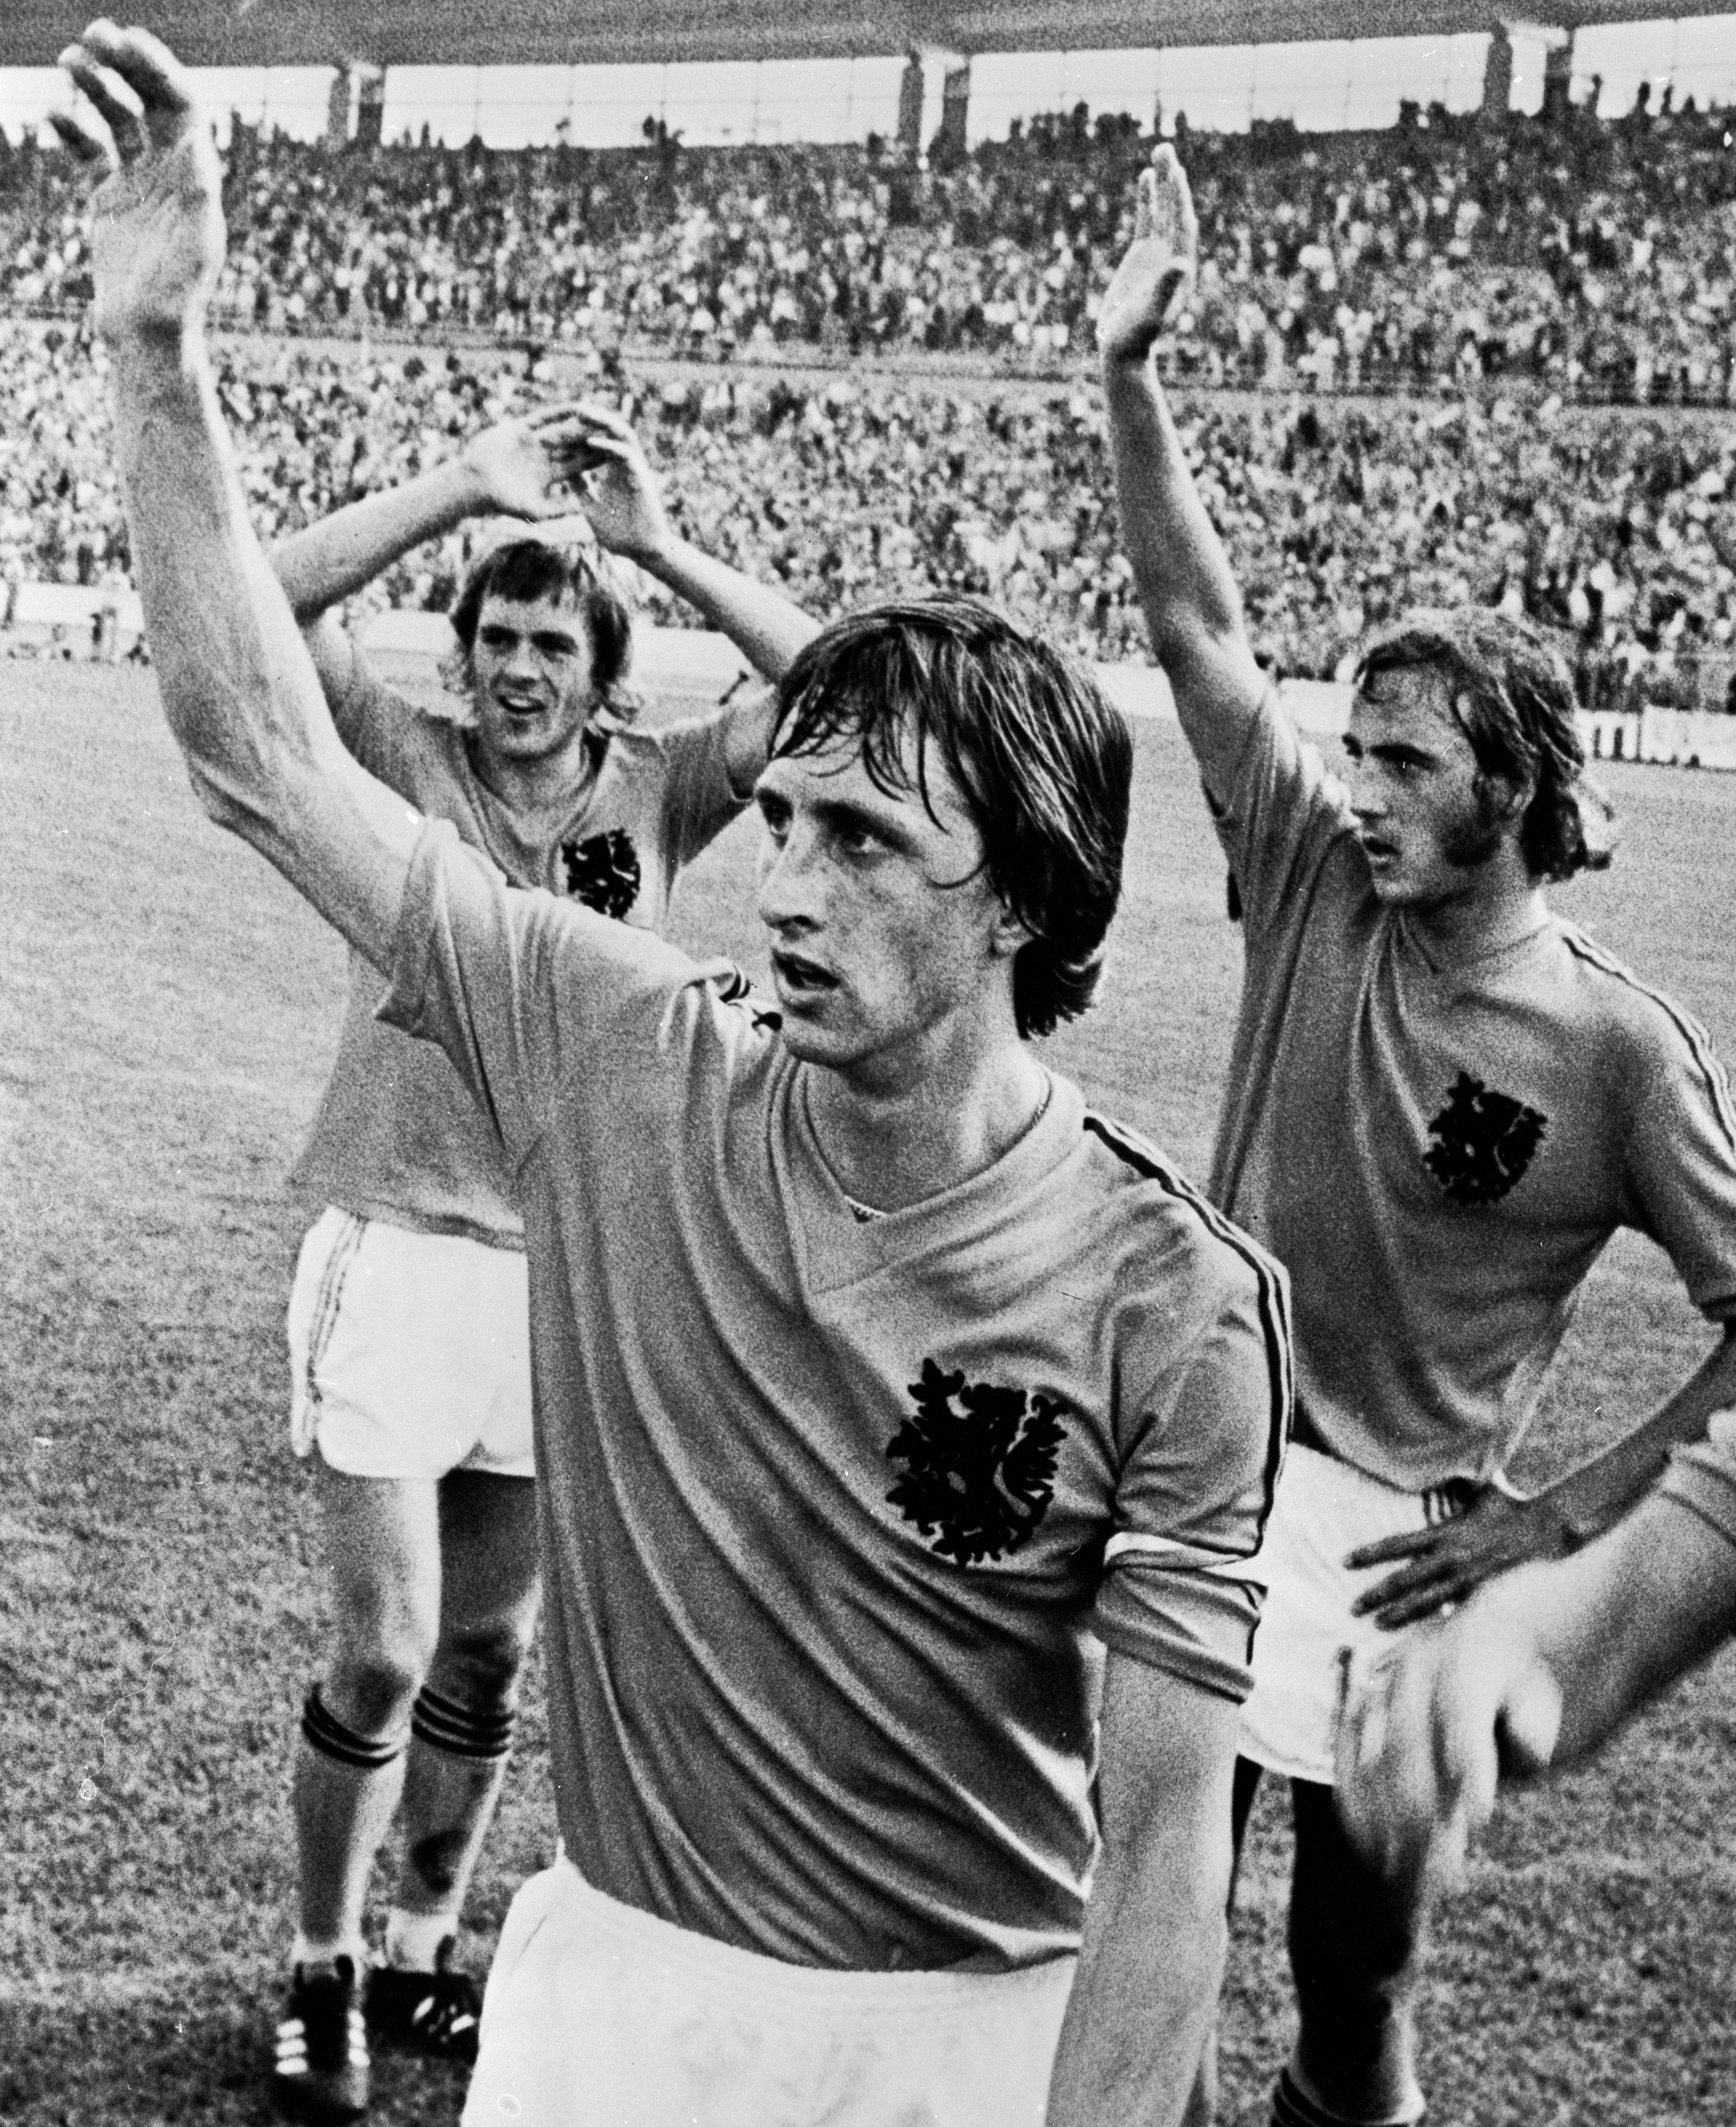 1974 World Cup final